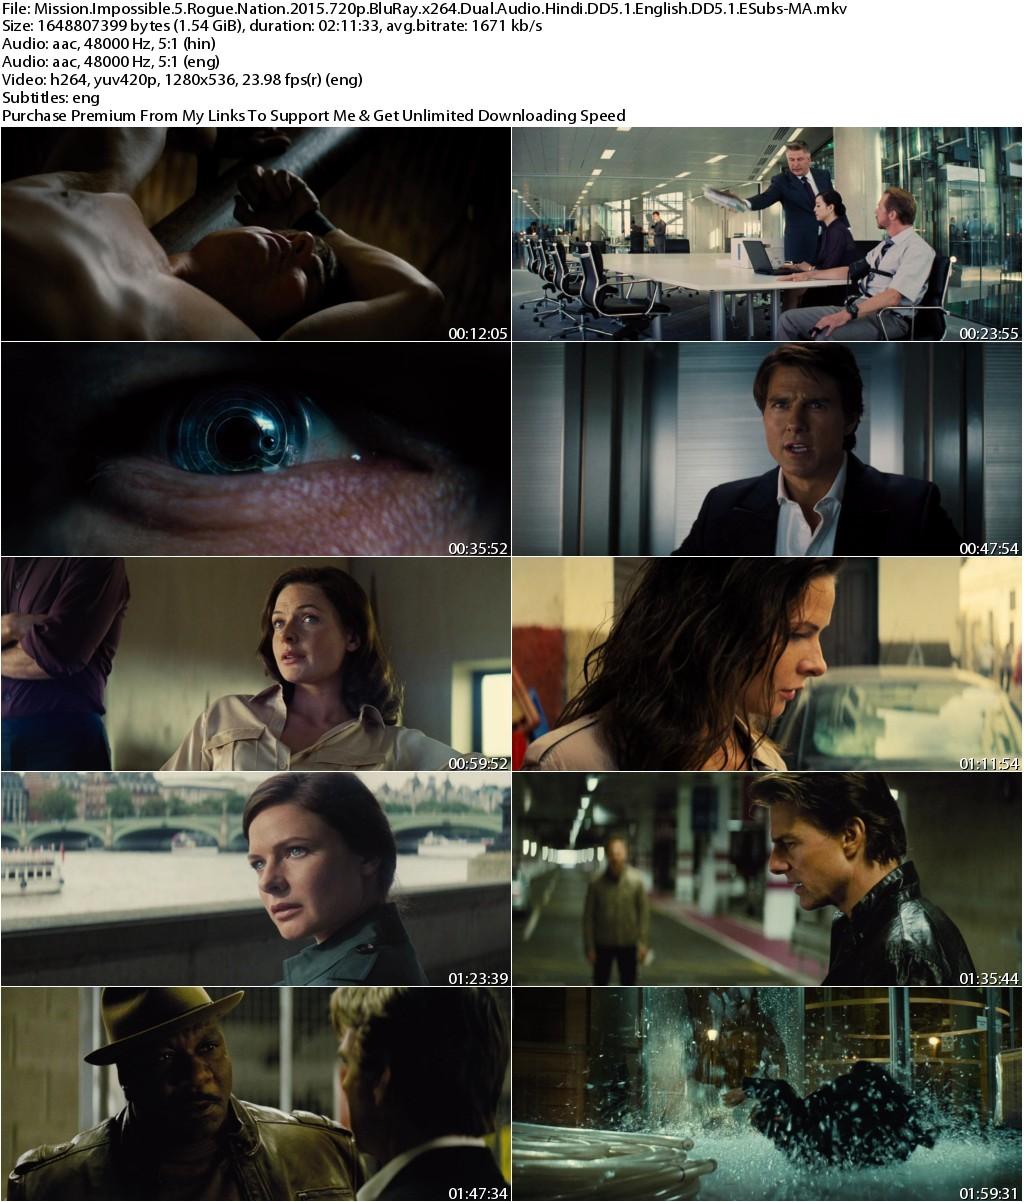 Mission Impossible Rogue Nation (2015) 720p BluRay x264 Dual Audio Hindi DD5.1 English DD5.1 ESubs-MA